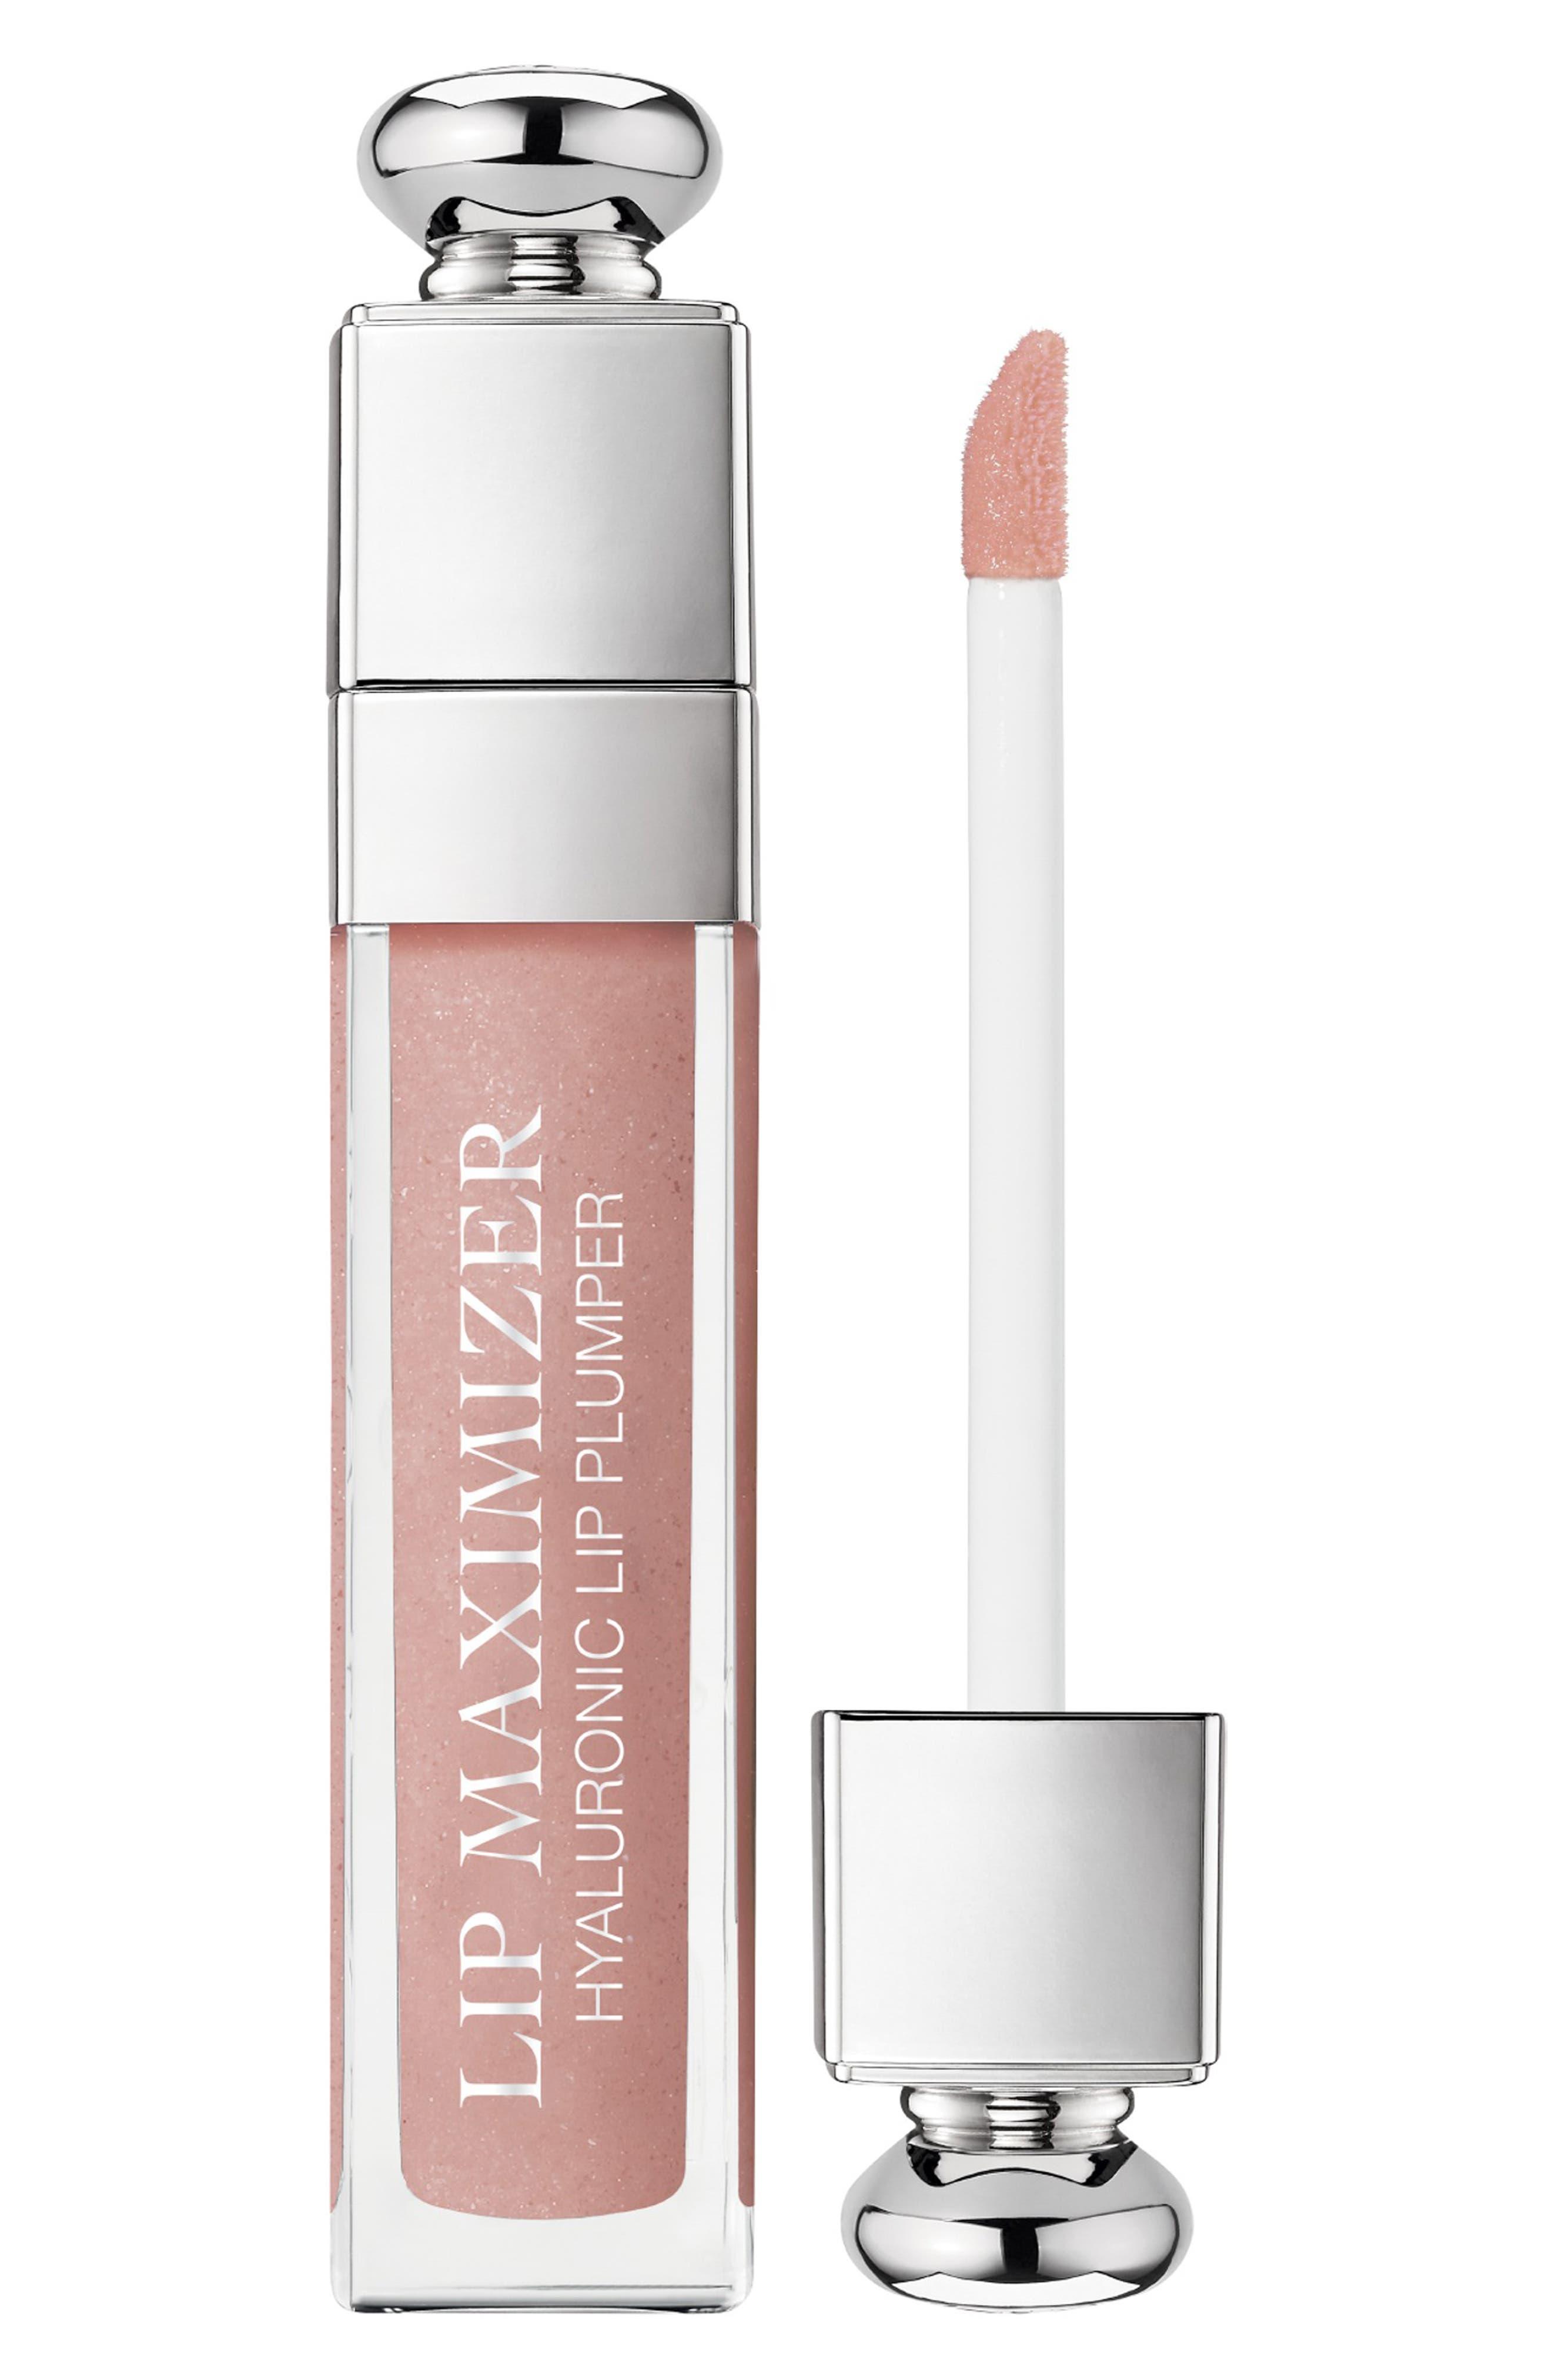 Dior Addict Lip Maximizer - 013 Beige Sunrise/ Glow